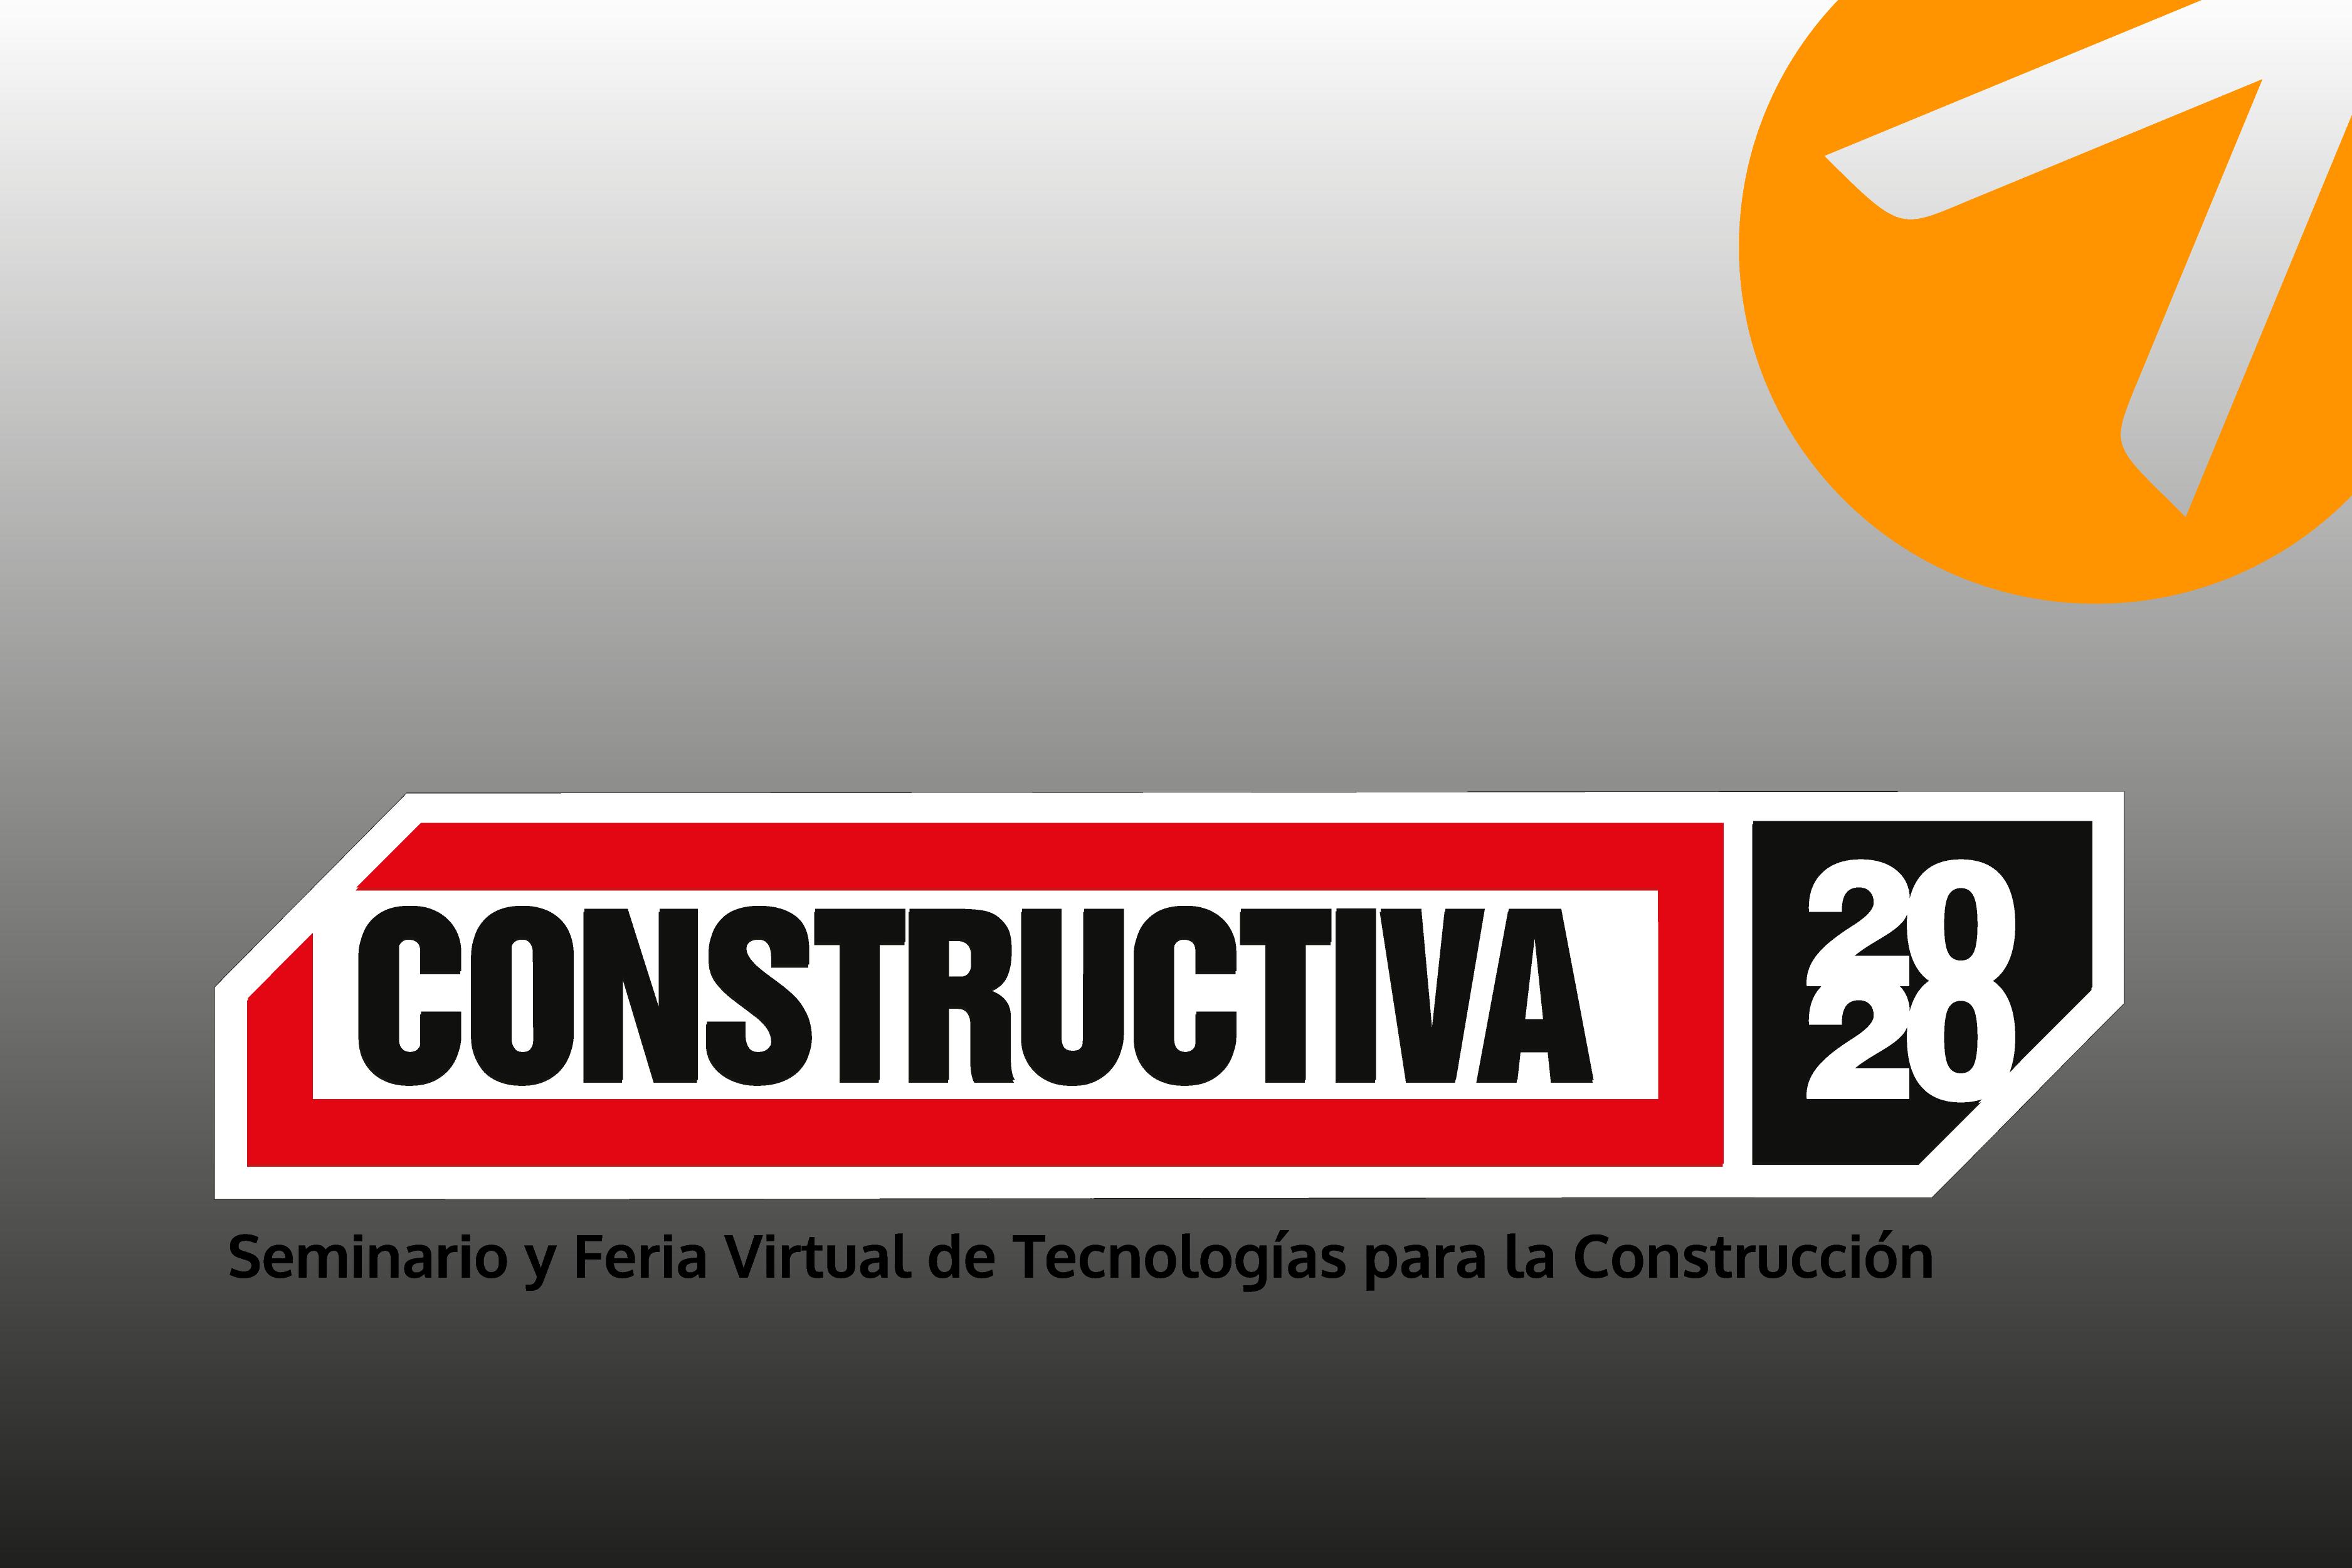 Constructiva 2020